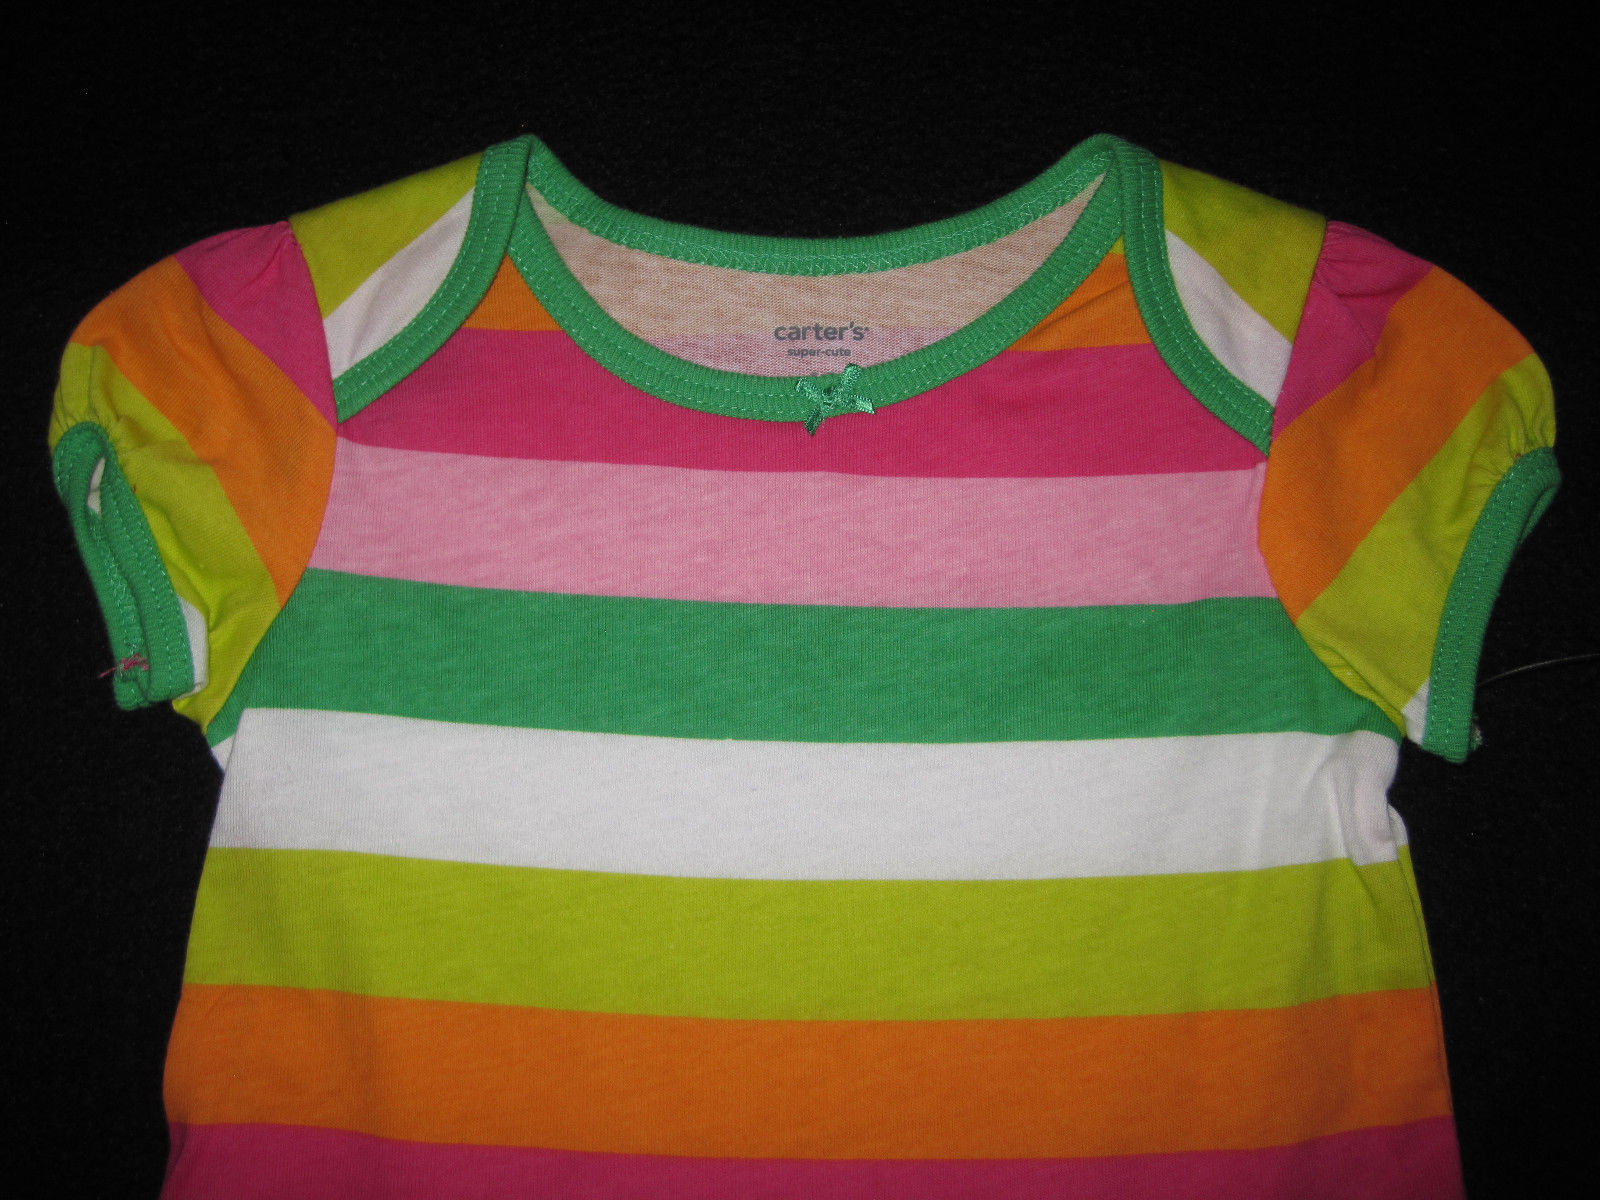 GIRLS 12 MONTHS - Carter's Everyday - Knit 3-PIECE DRESS & PANTY SET image 6